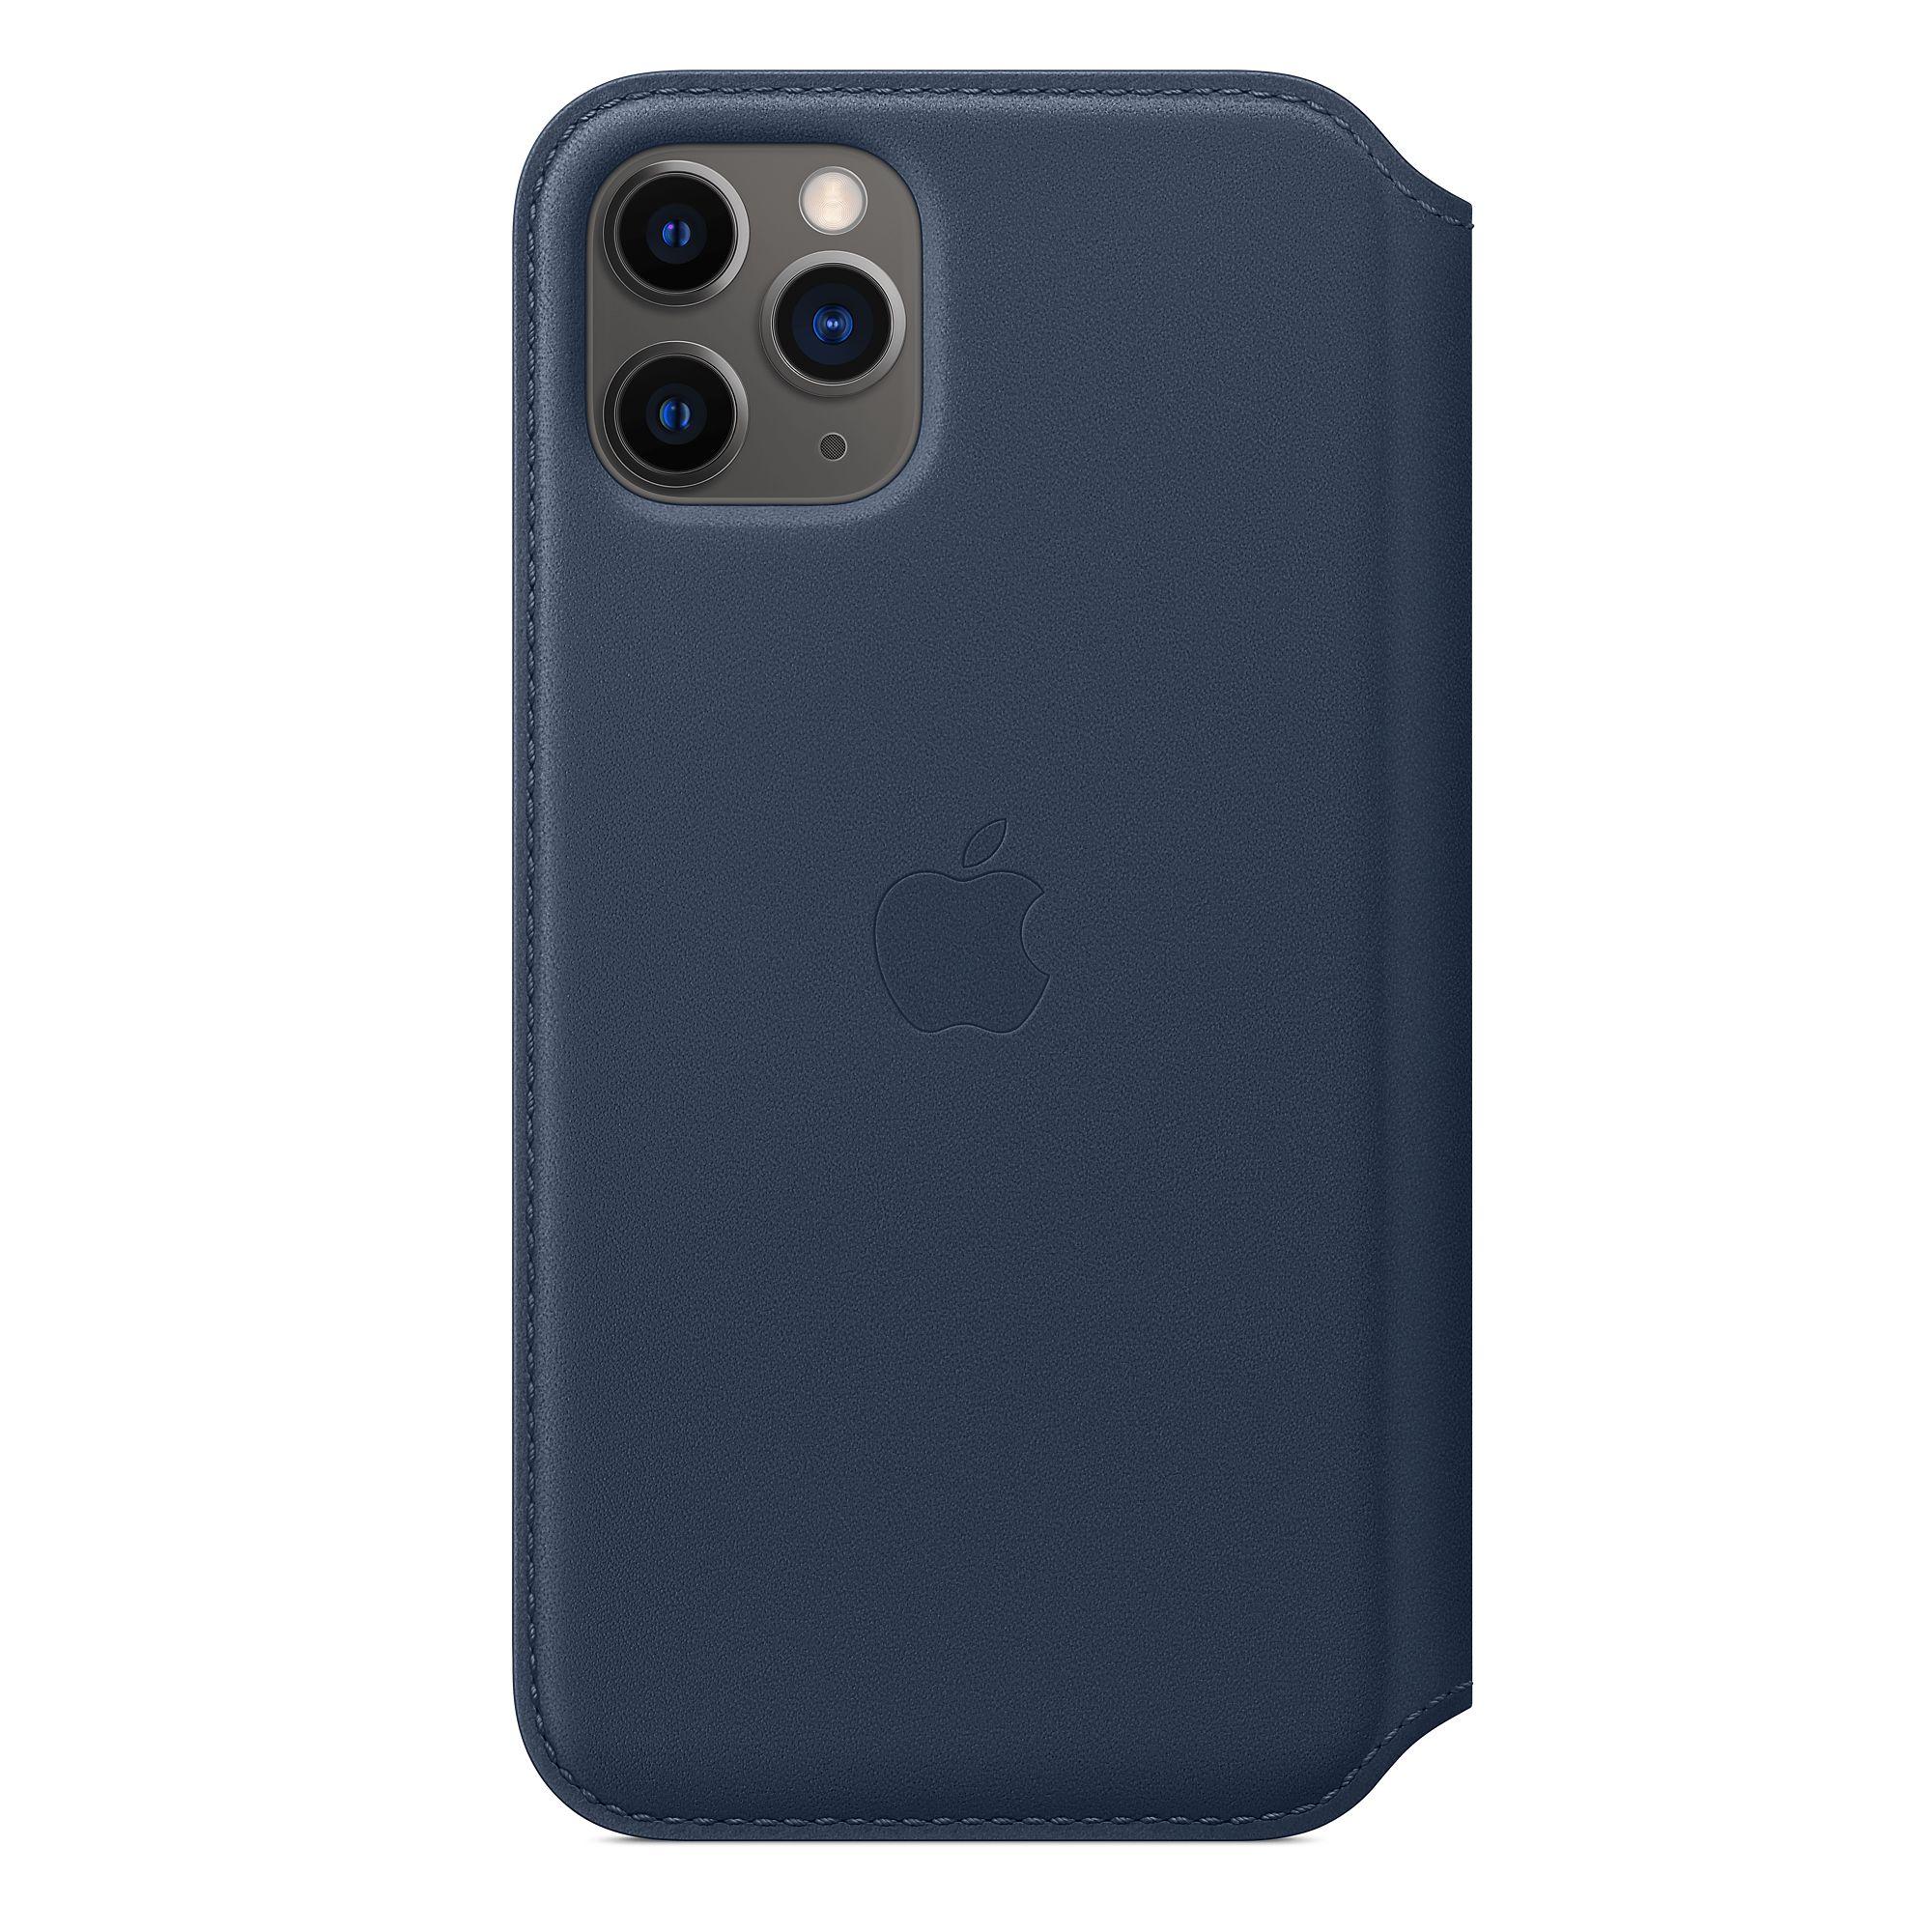 Funda Leather Folio para el iPhone 11 Pro Azul profundo